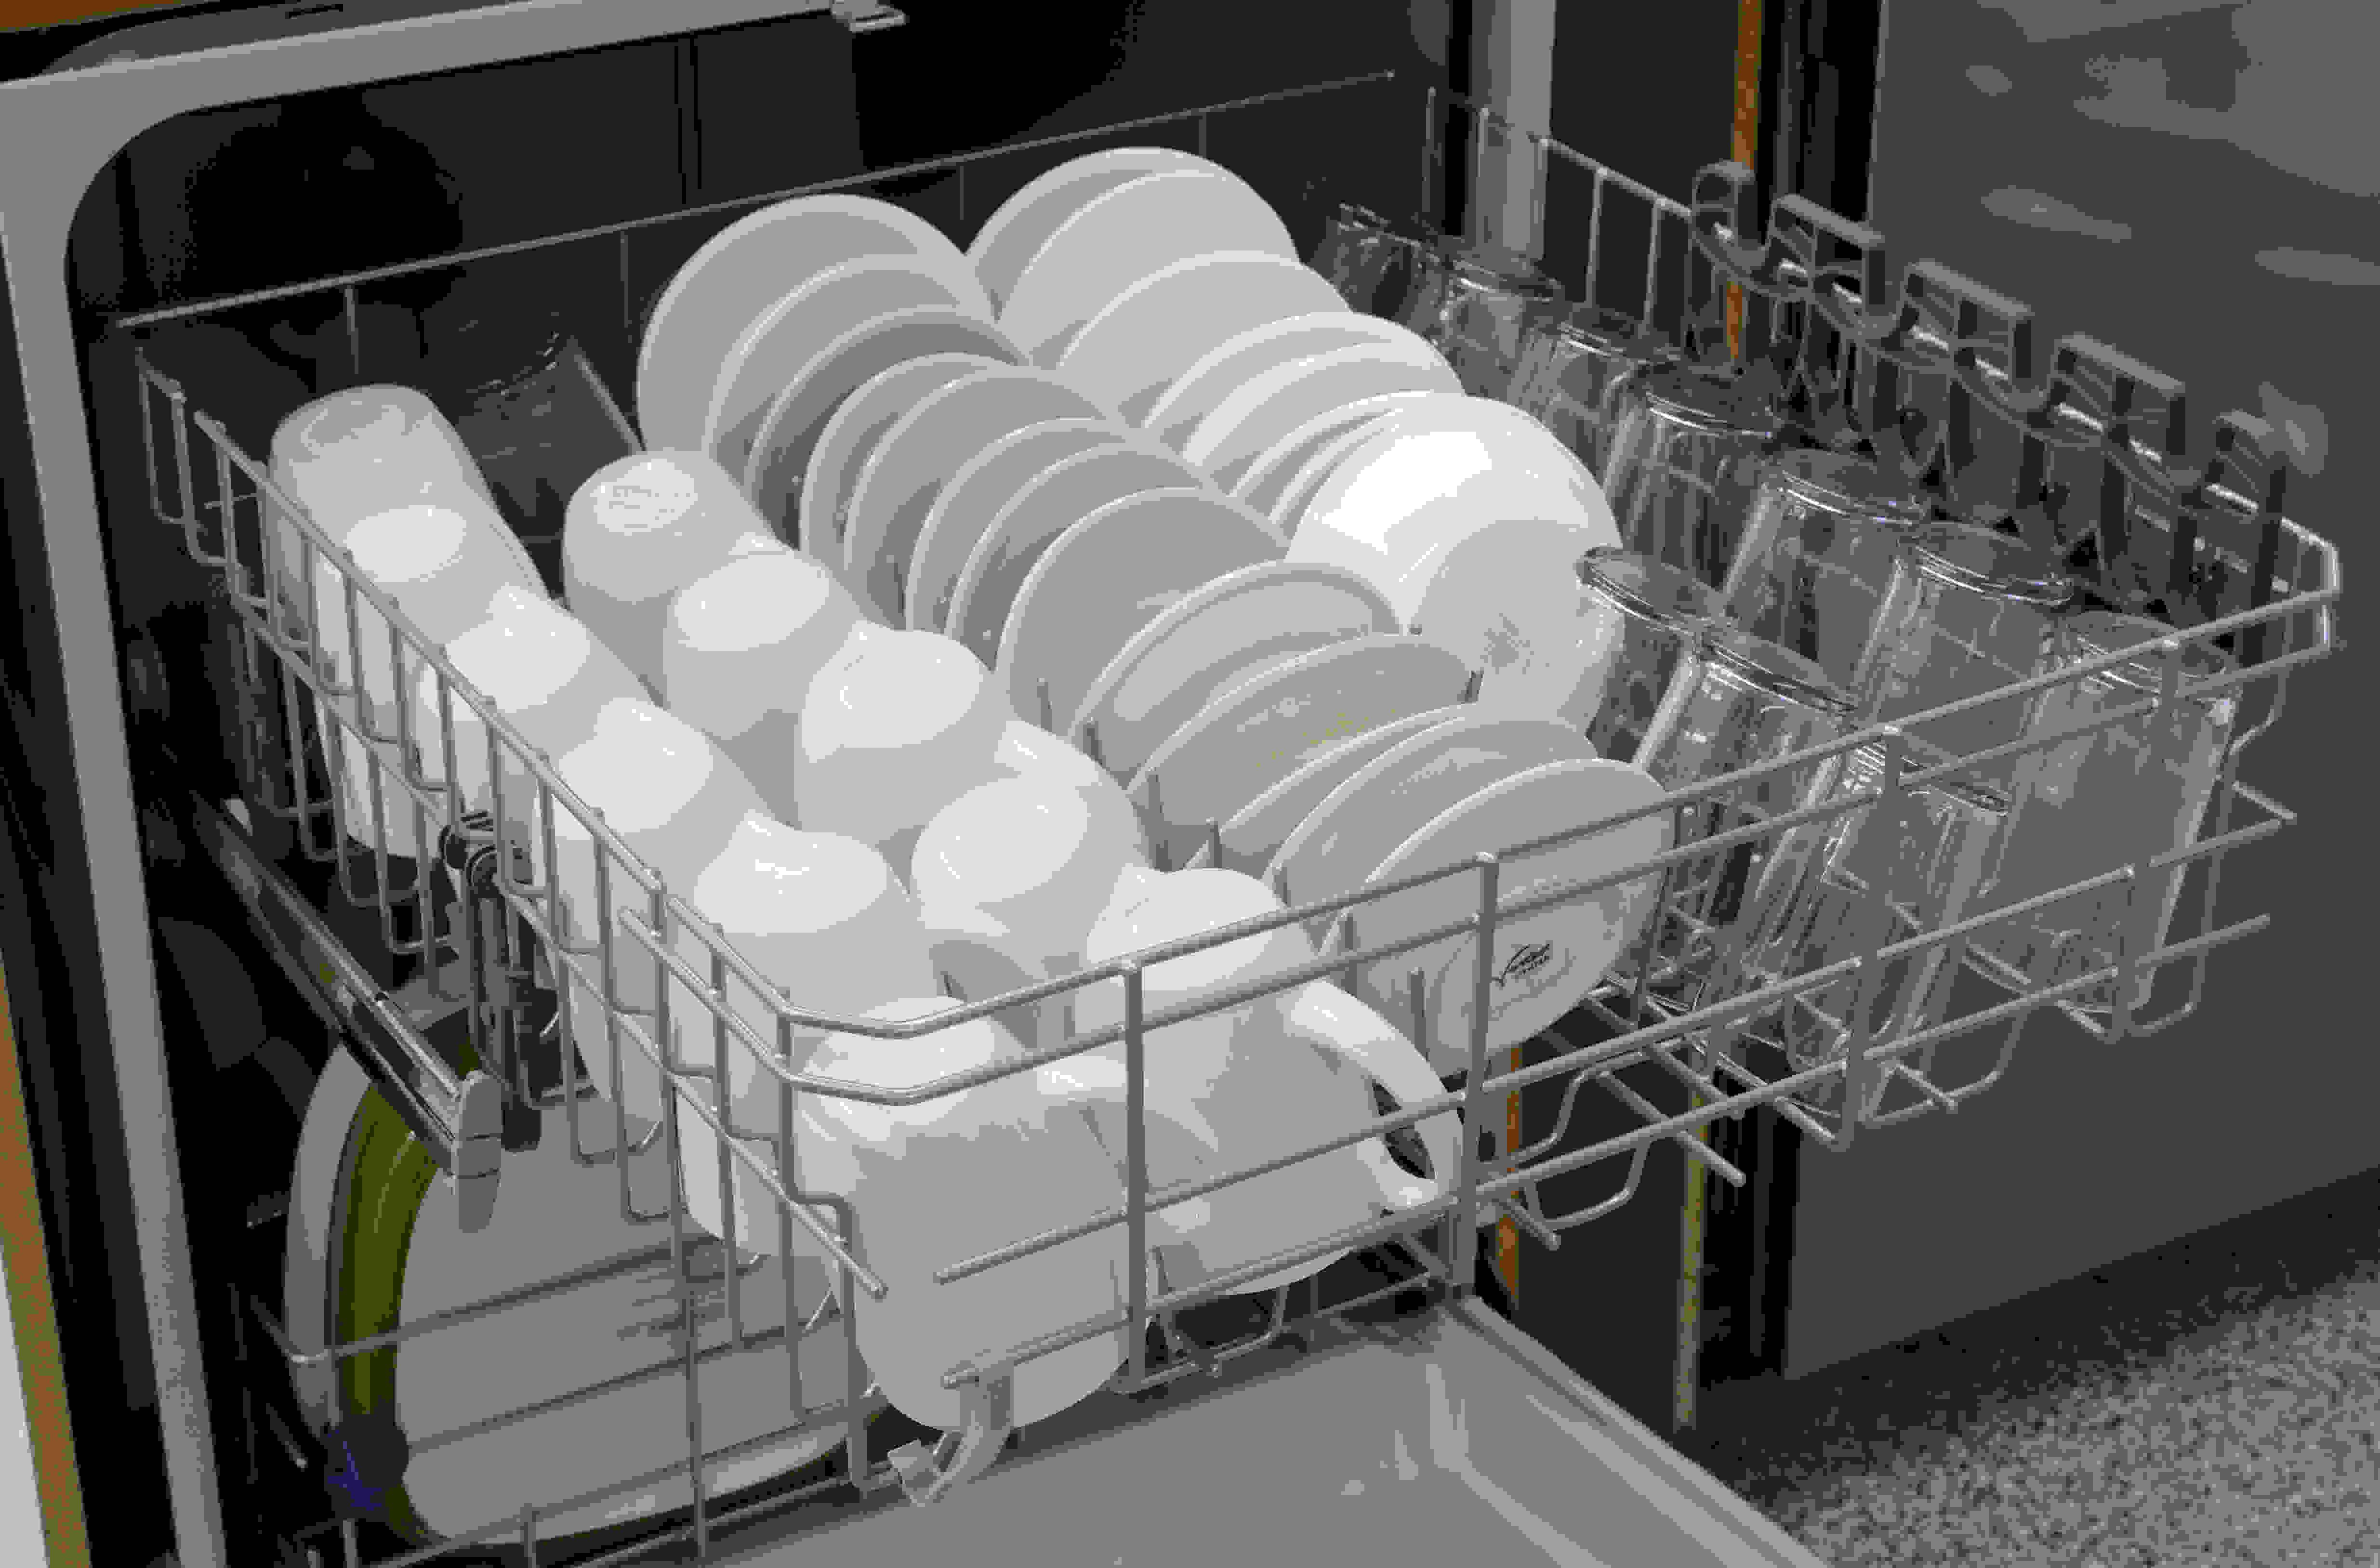 Whirlpool WDF540PADM upper rack loaded